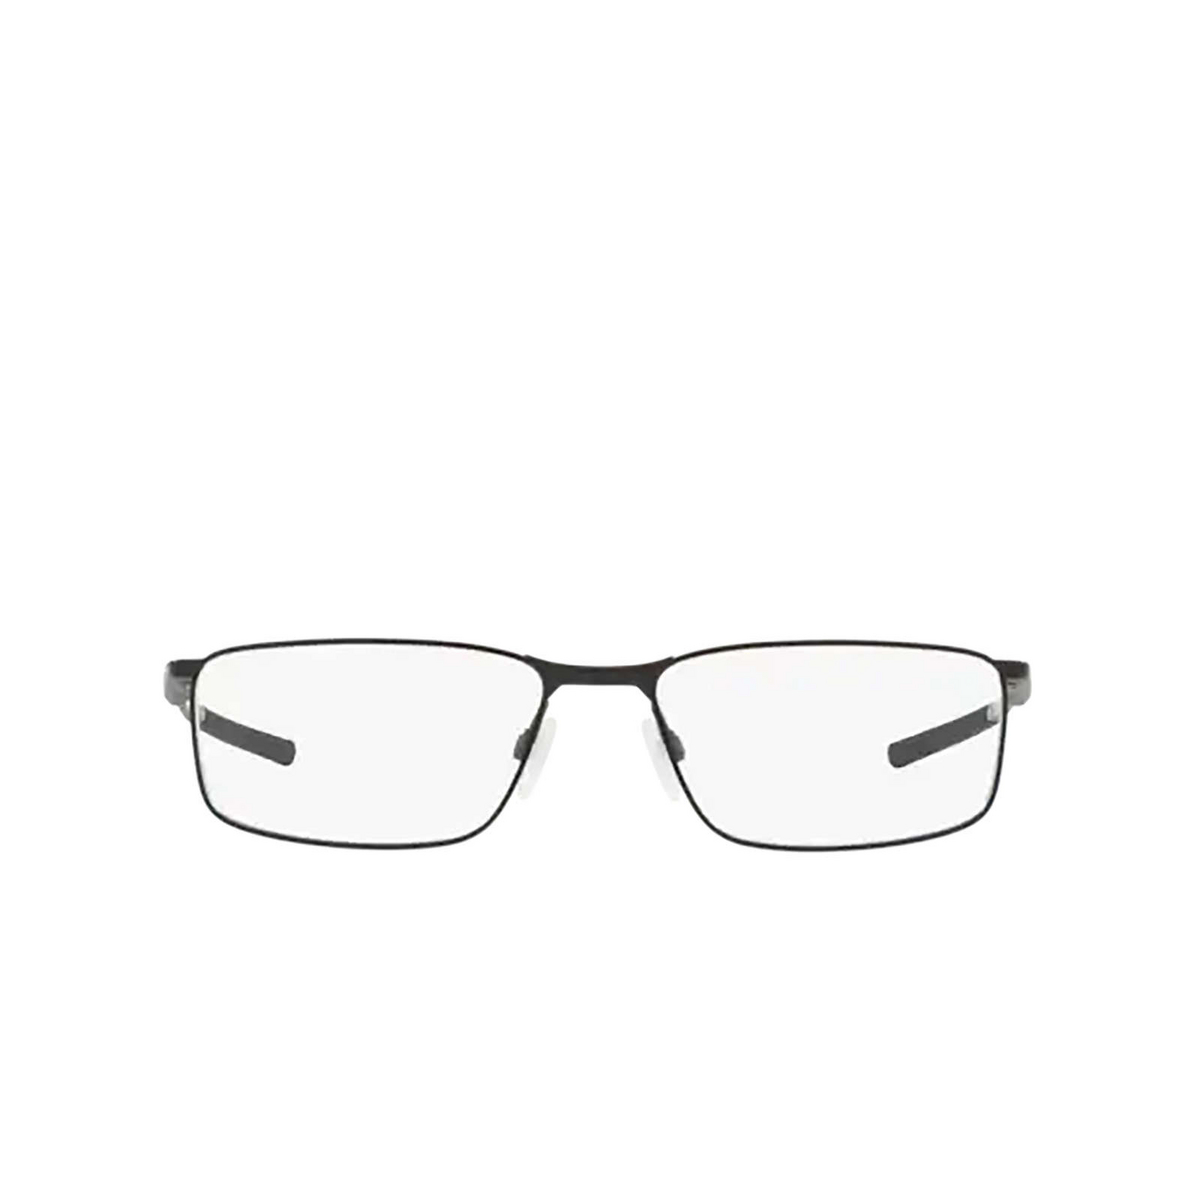 Oakley® Rectangle Eyeglasses: Socket 5.0 OX3217 color Satin Black 321701 - front view.